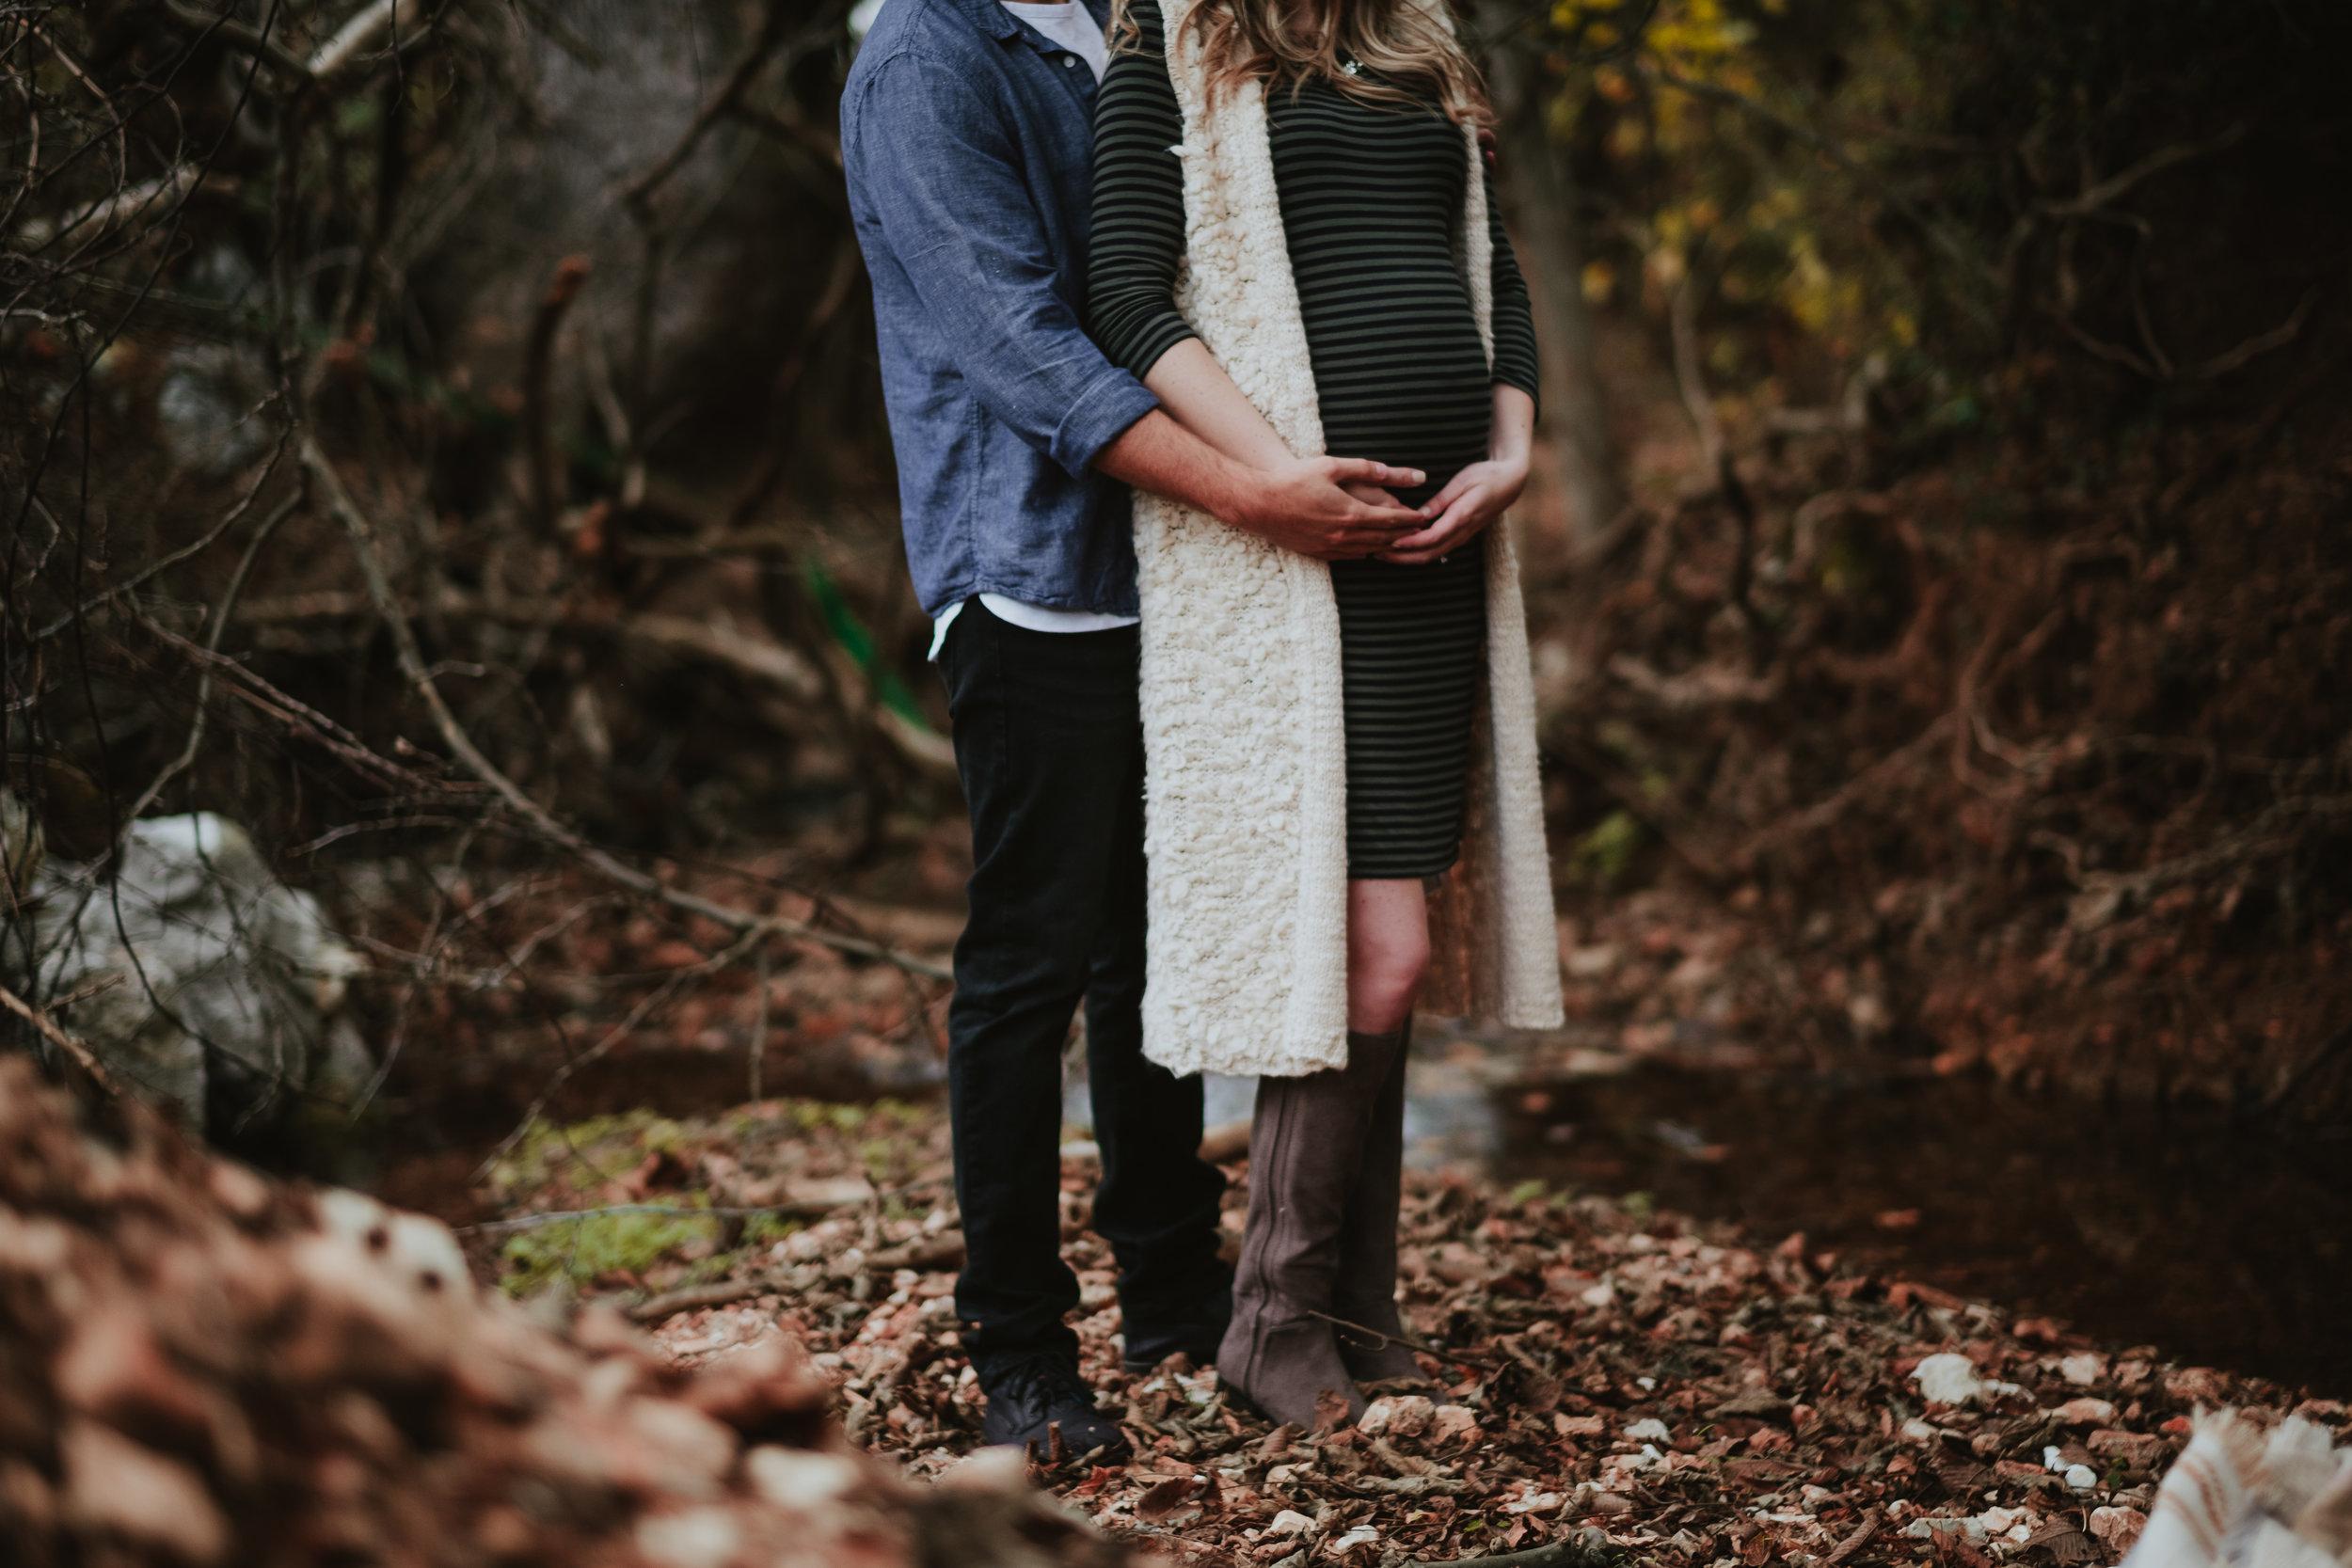 Micah.Chris.Maternity.2016.Delyn.Megan.Stirewalt-18.jpg